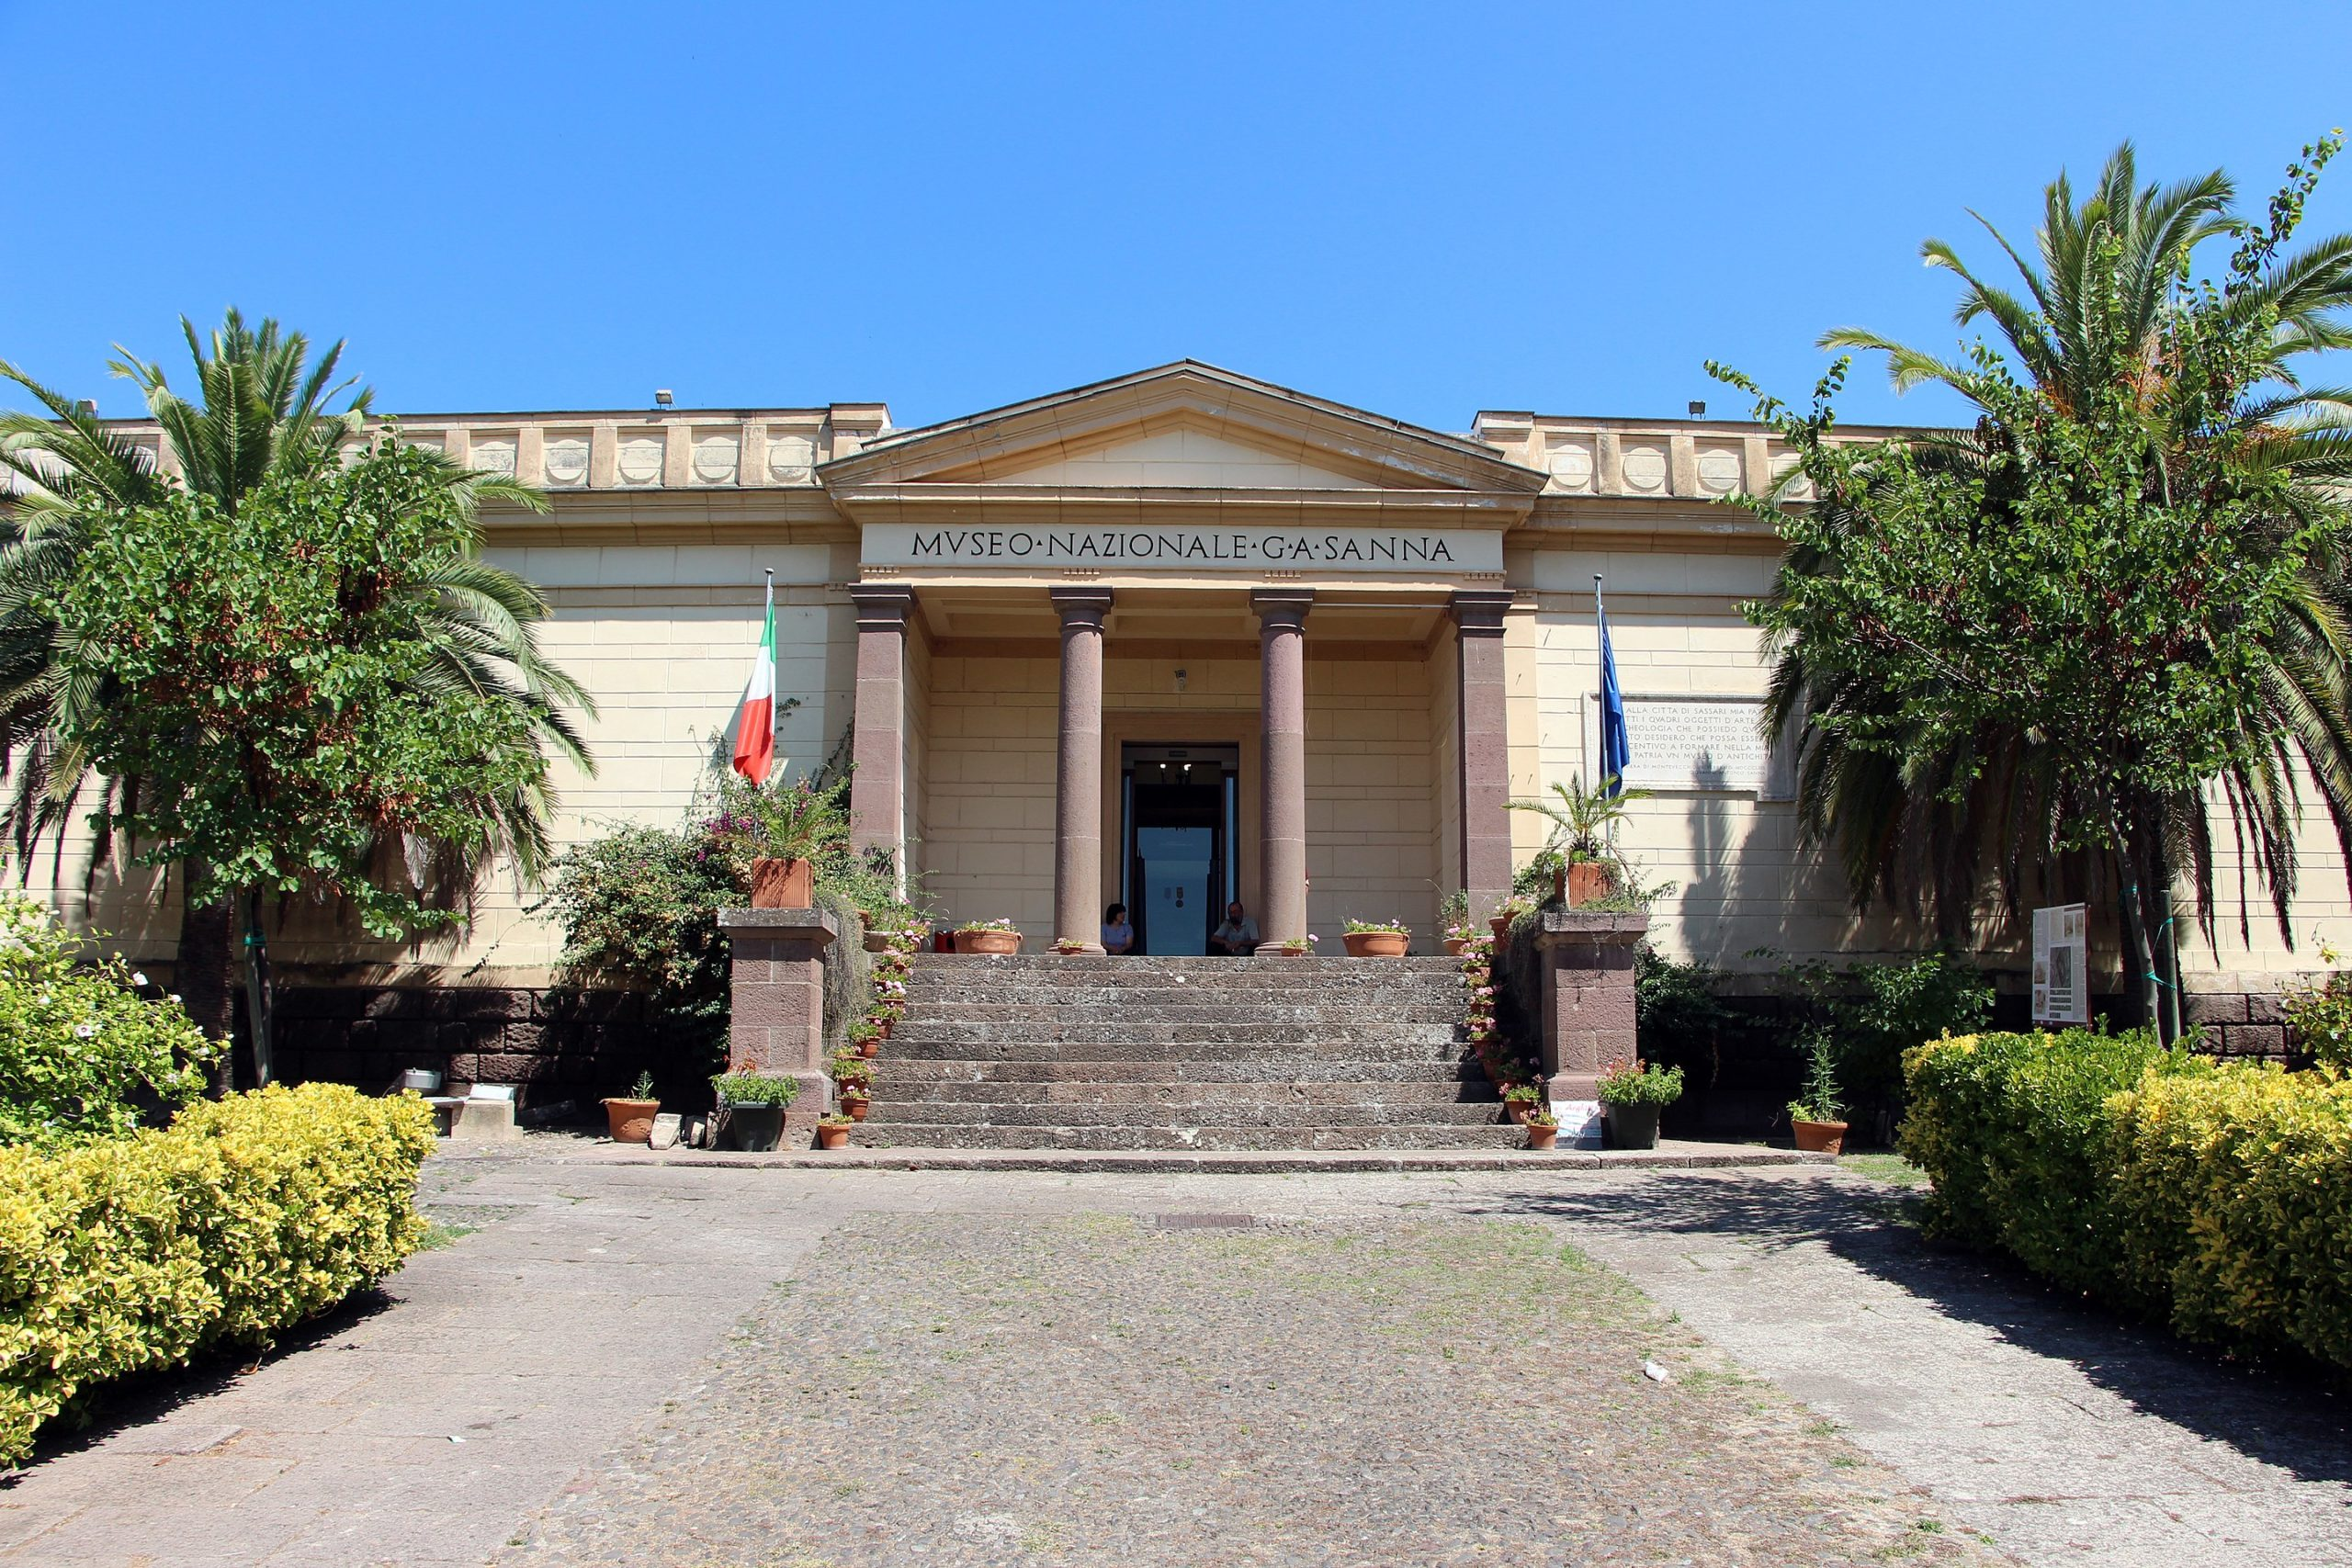 Museo nazionale G.A. Sanna